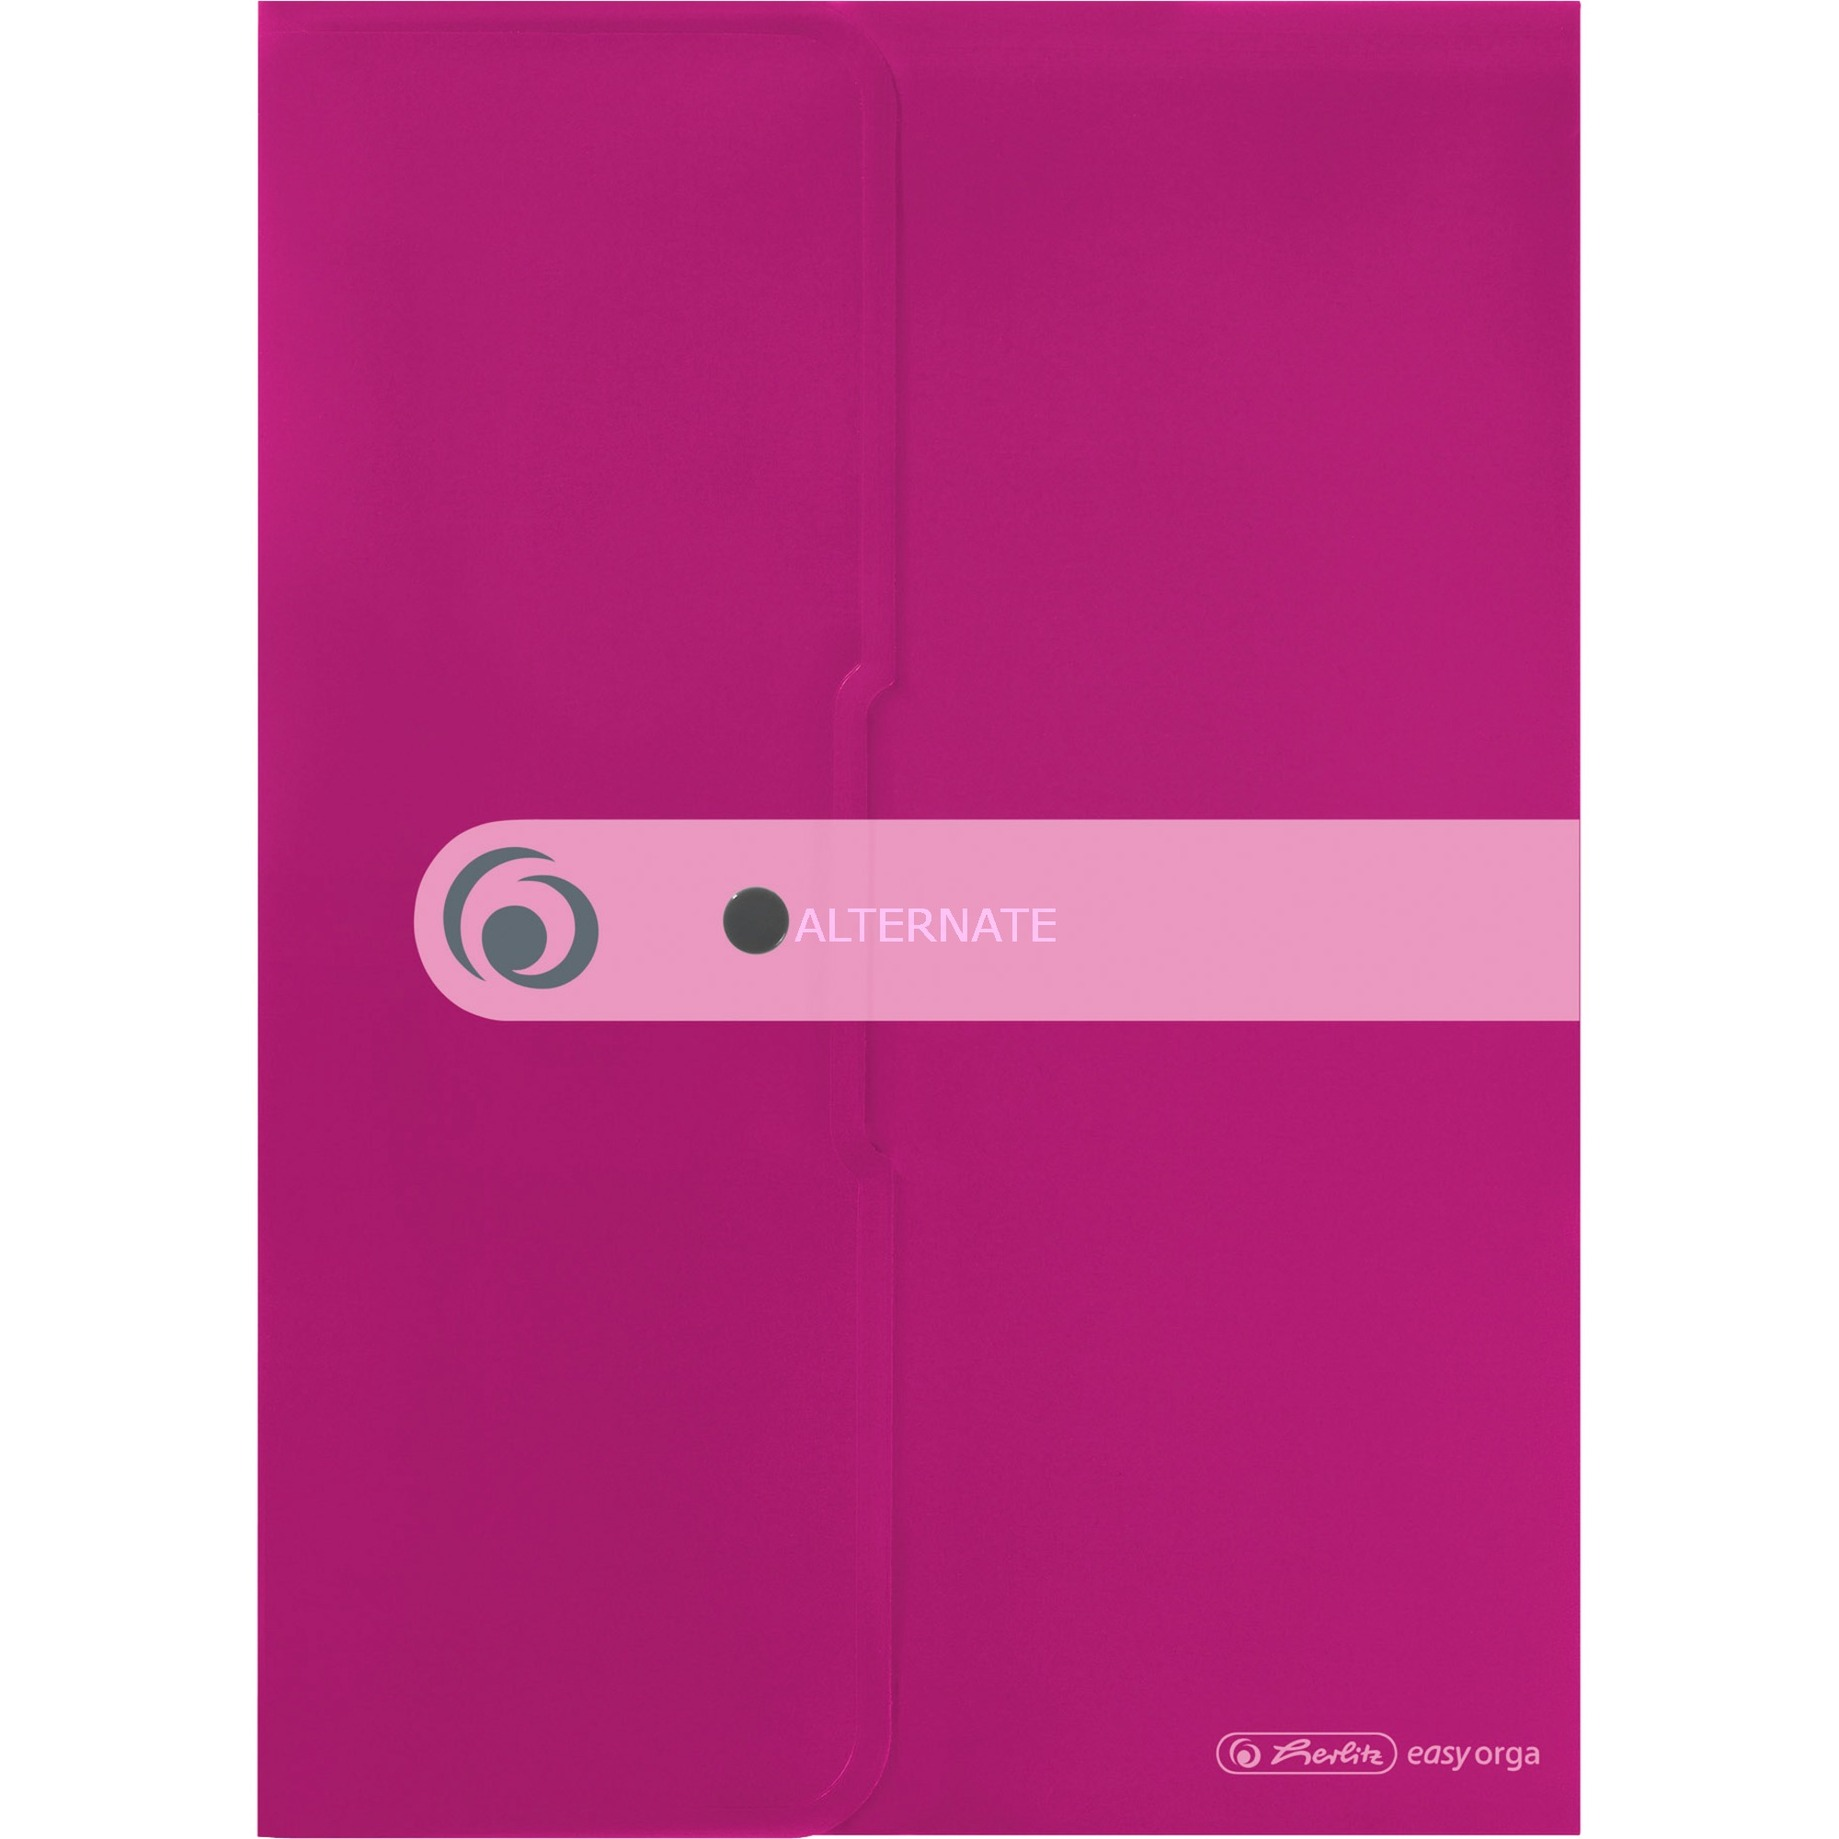 11217122 Polipropileno (PP) Rosa carpeta, Bolsa